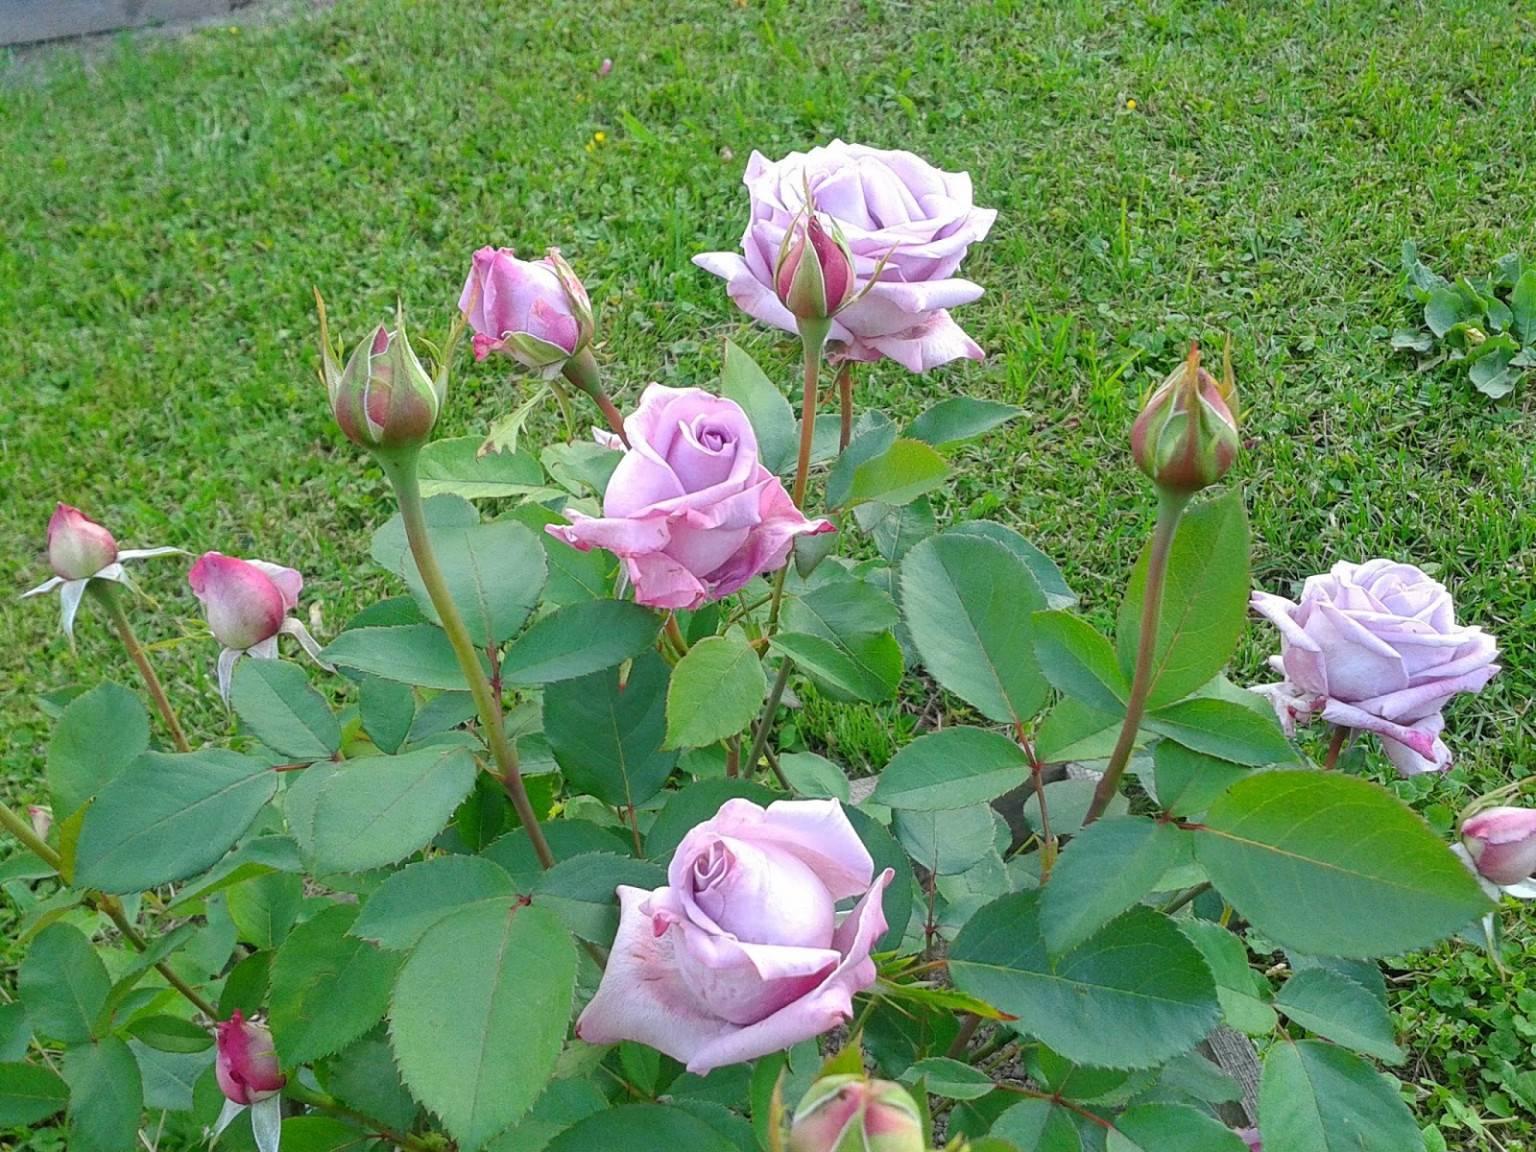 Саженцы роз майнцер фастнахт mainzer fastnacht, цена 180 руб., купить в белгороде — tiu.ru (id#15786895)